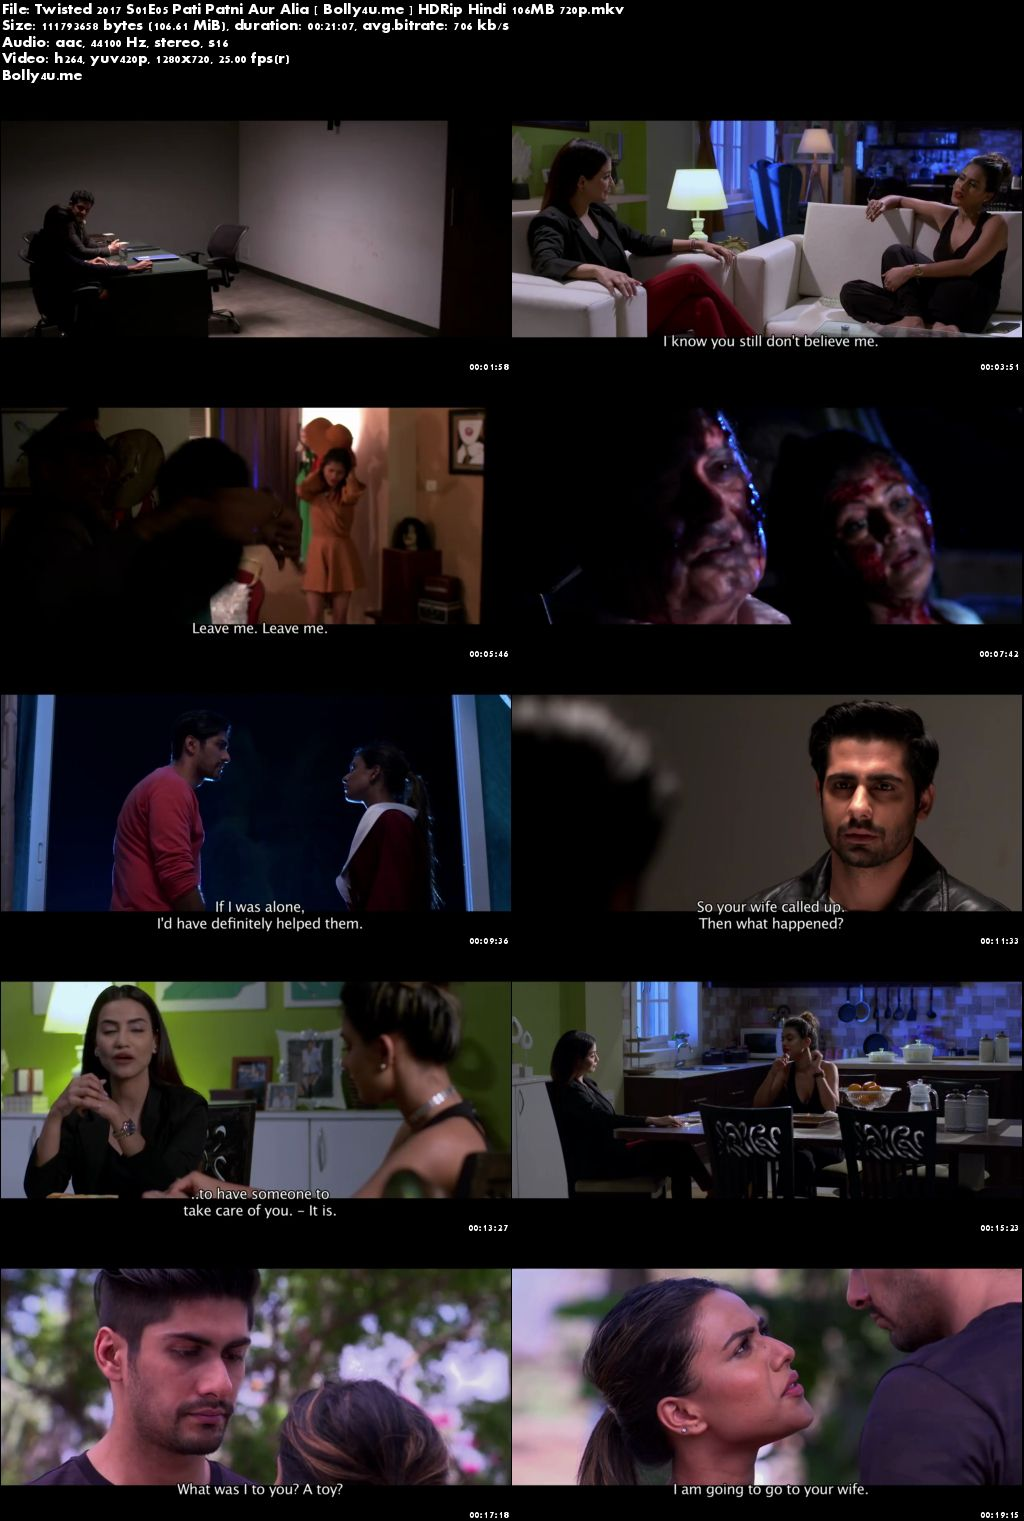 Twisted 2017 S01E05 Pati Patni Aur Alia HDRip 100Mb Hindi 720p Download